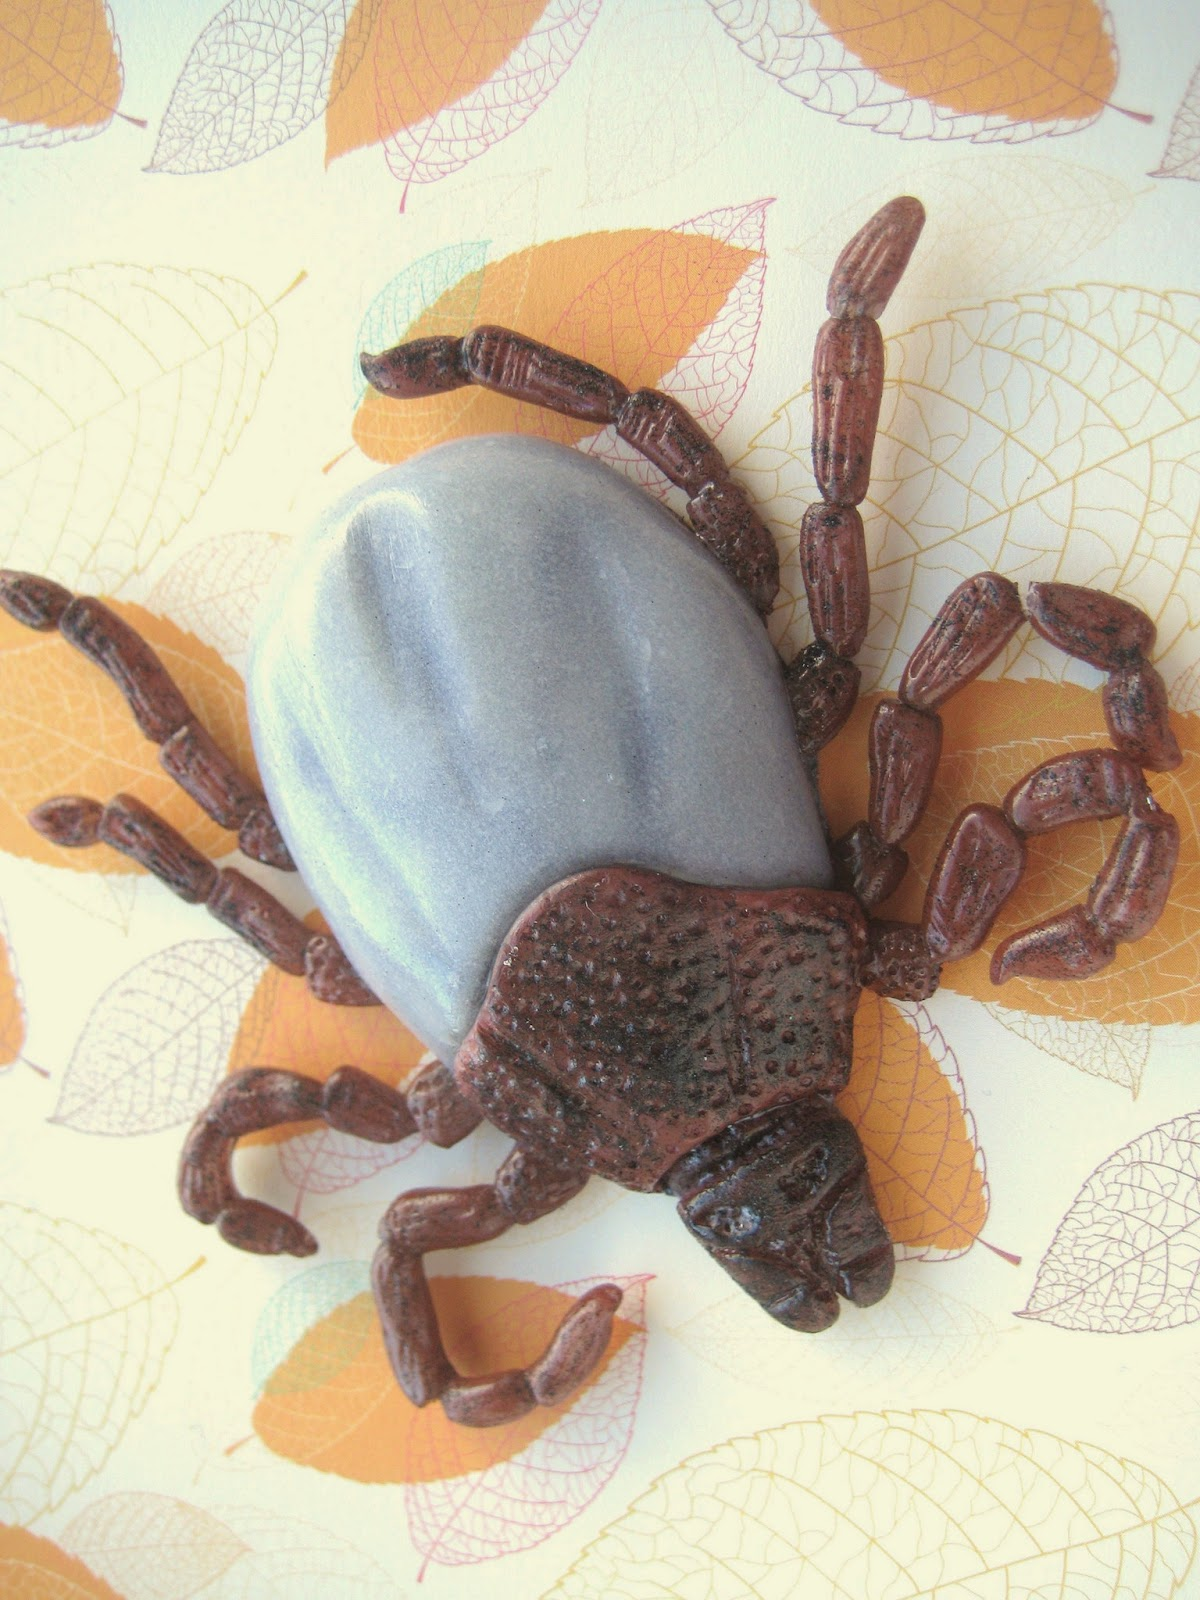 tick, ticks, kleszcze, fridgemagnets, magnes, worms,